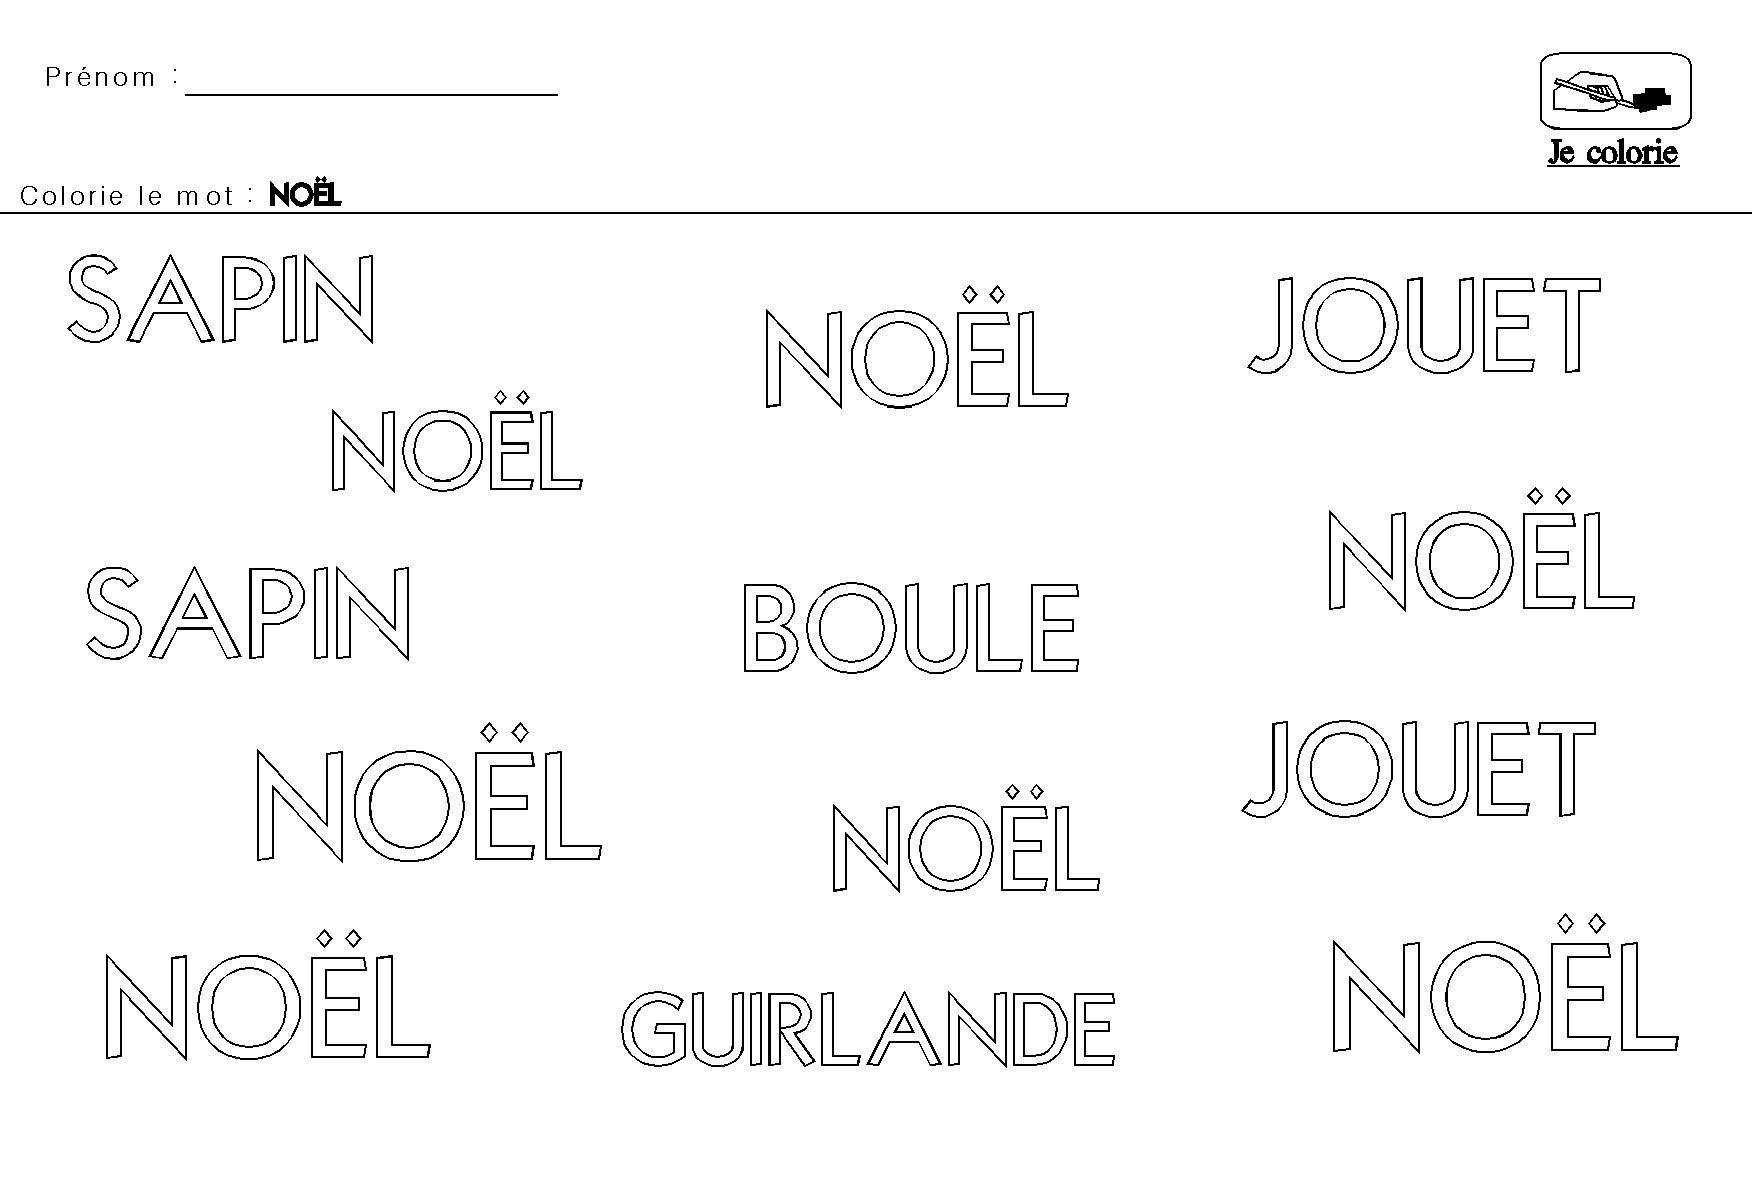 NOEL en MATERNELLE colorier le mot NOEL | Noel maternelle, Noel